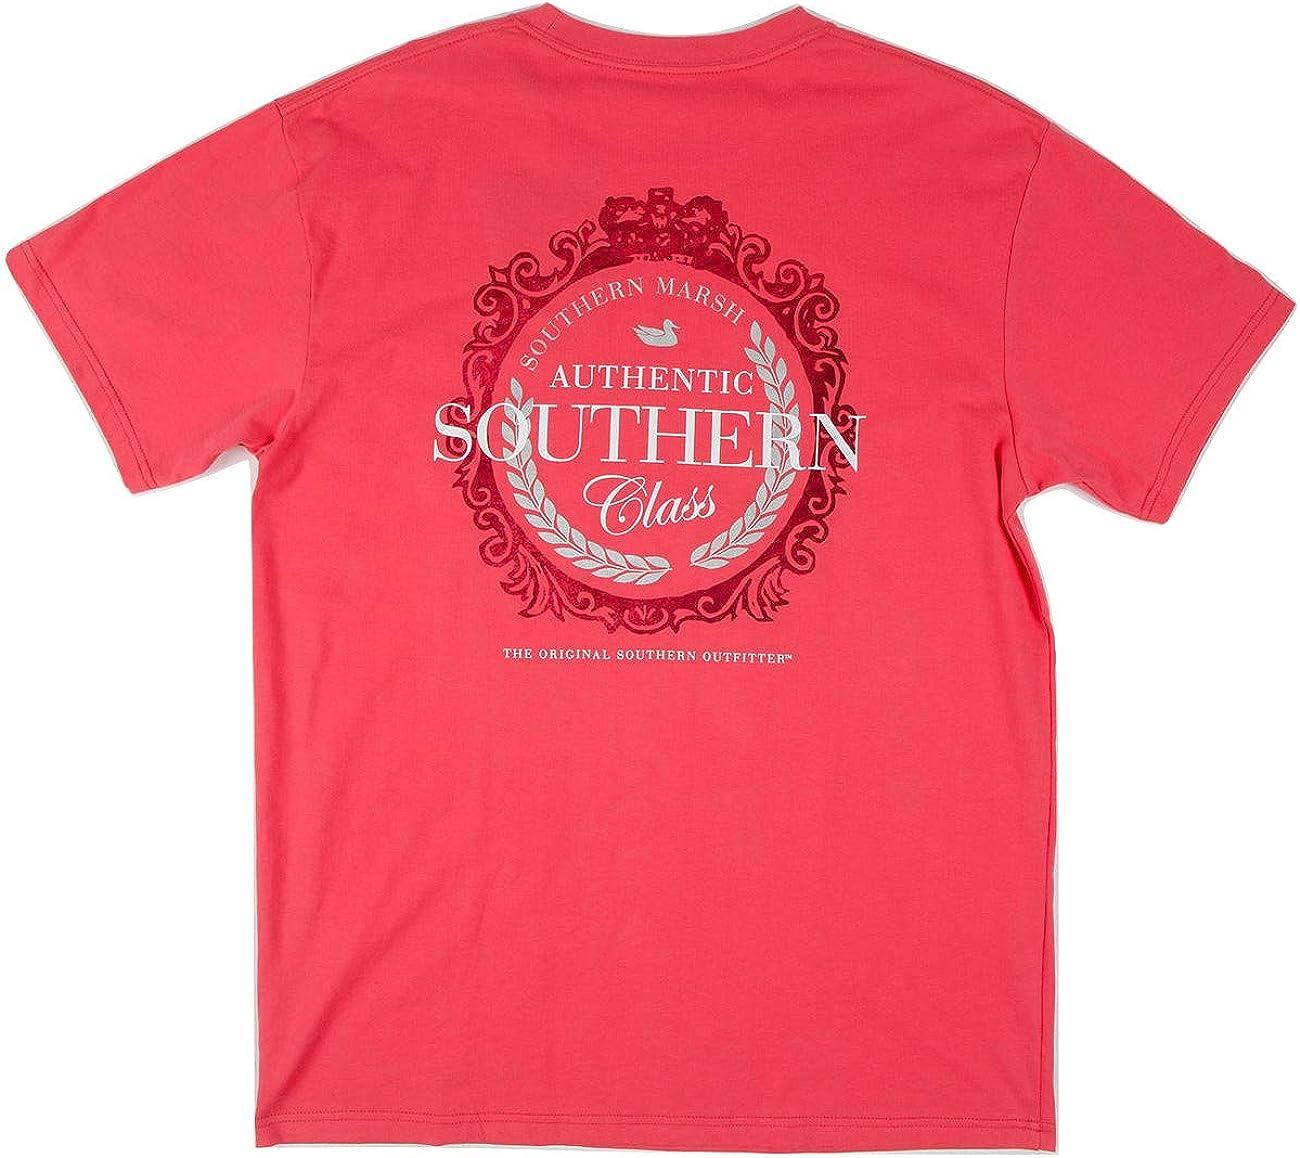 Southern Class